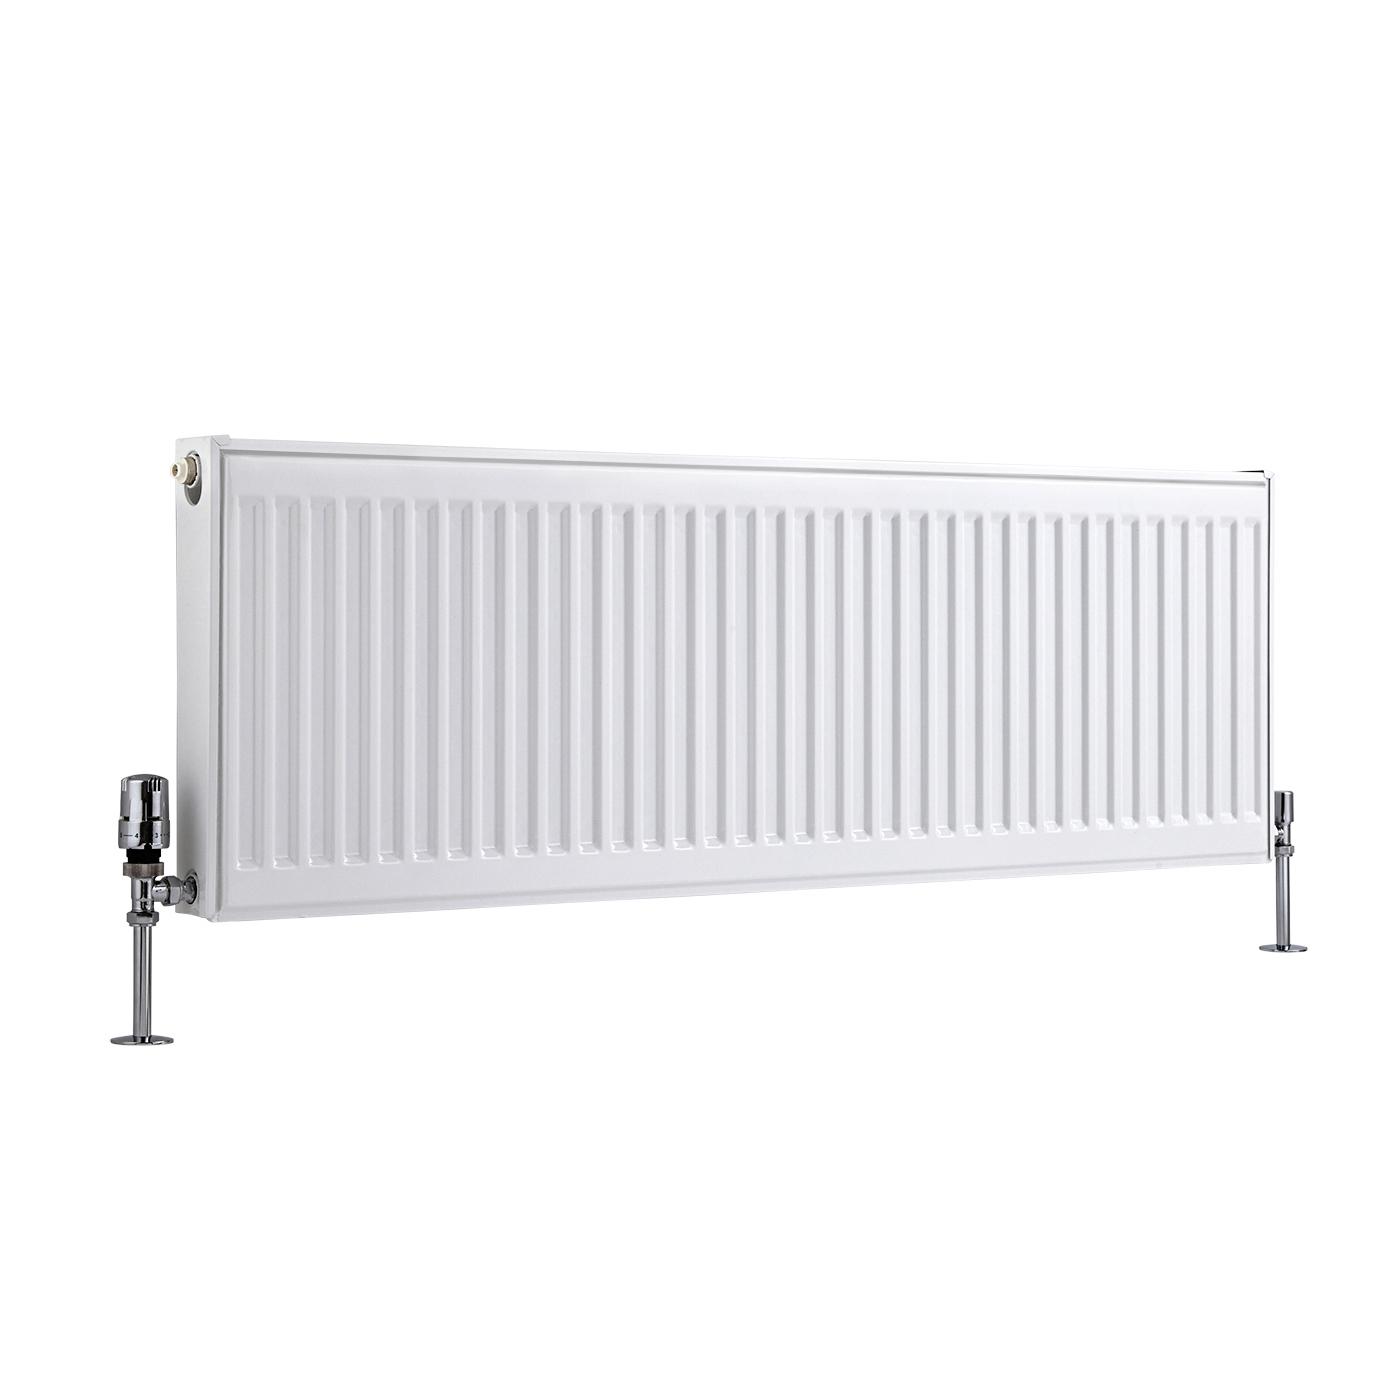 Radiateur À Panneaux Type 11 Horizontal Blanc Eco 40cm x 120cm x 5cm 820 Watts